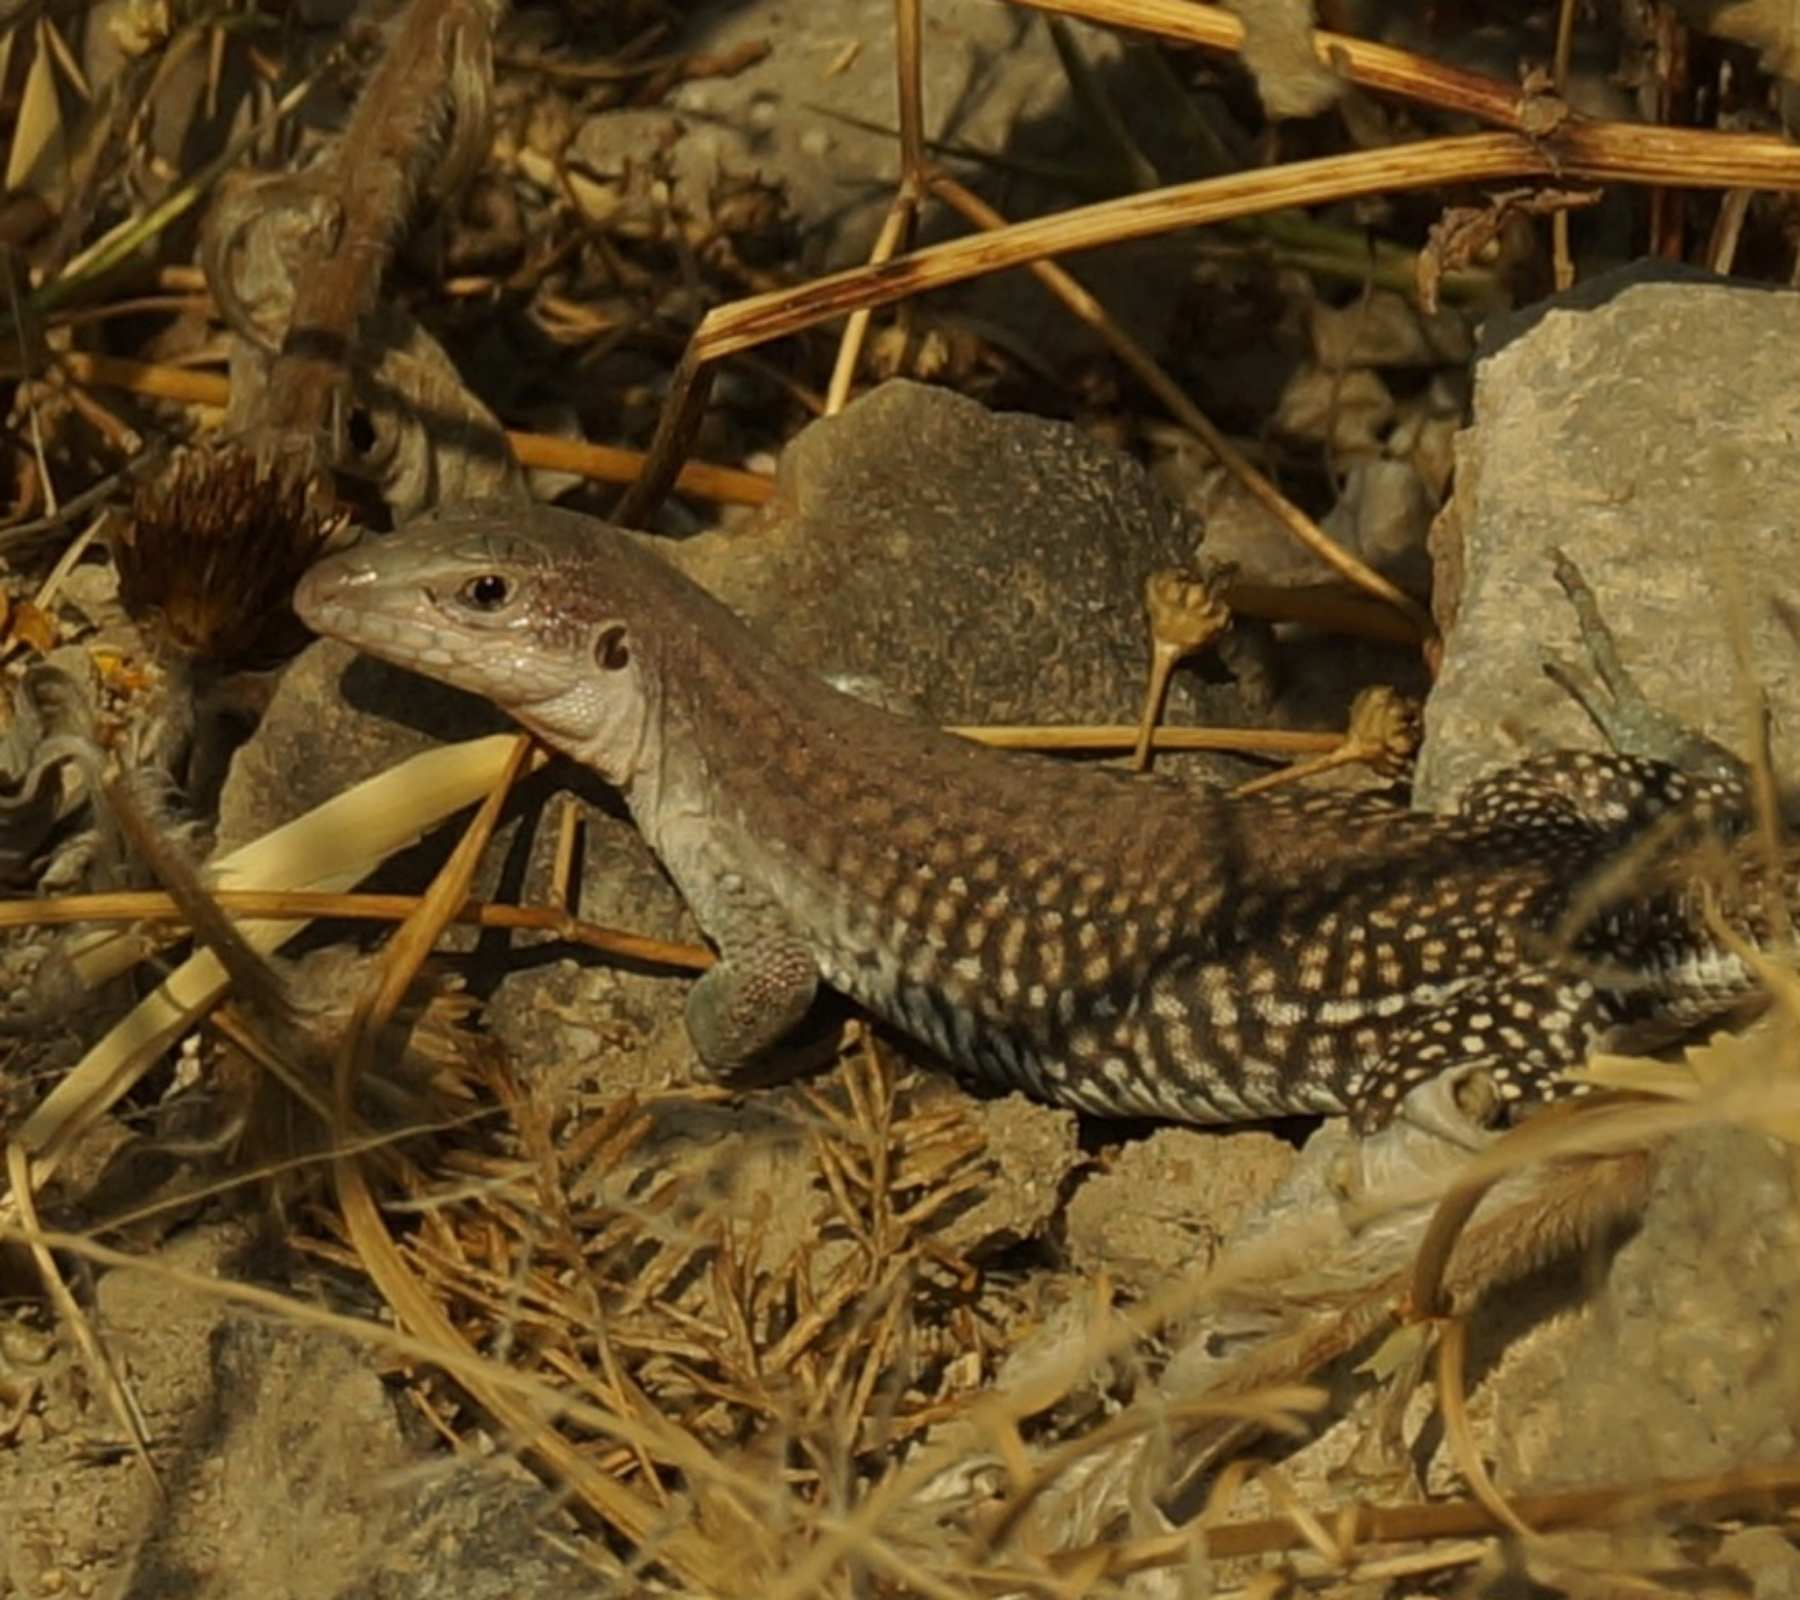 rana anfibios reptiles fauna amalucan